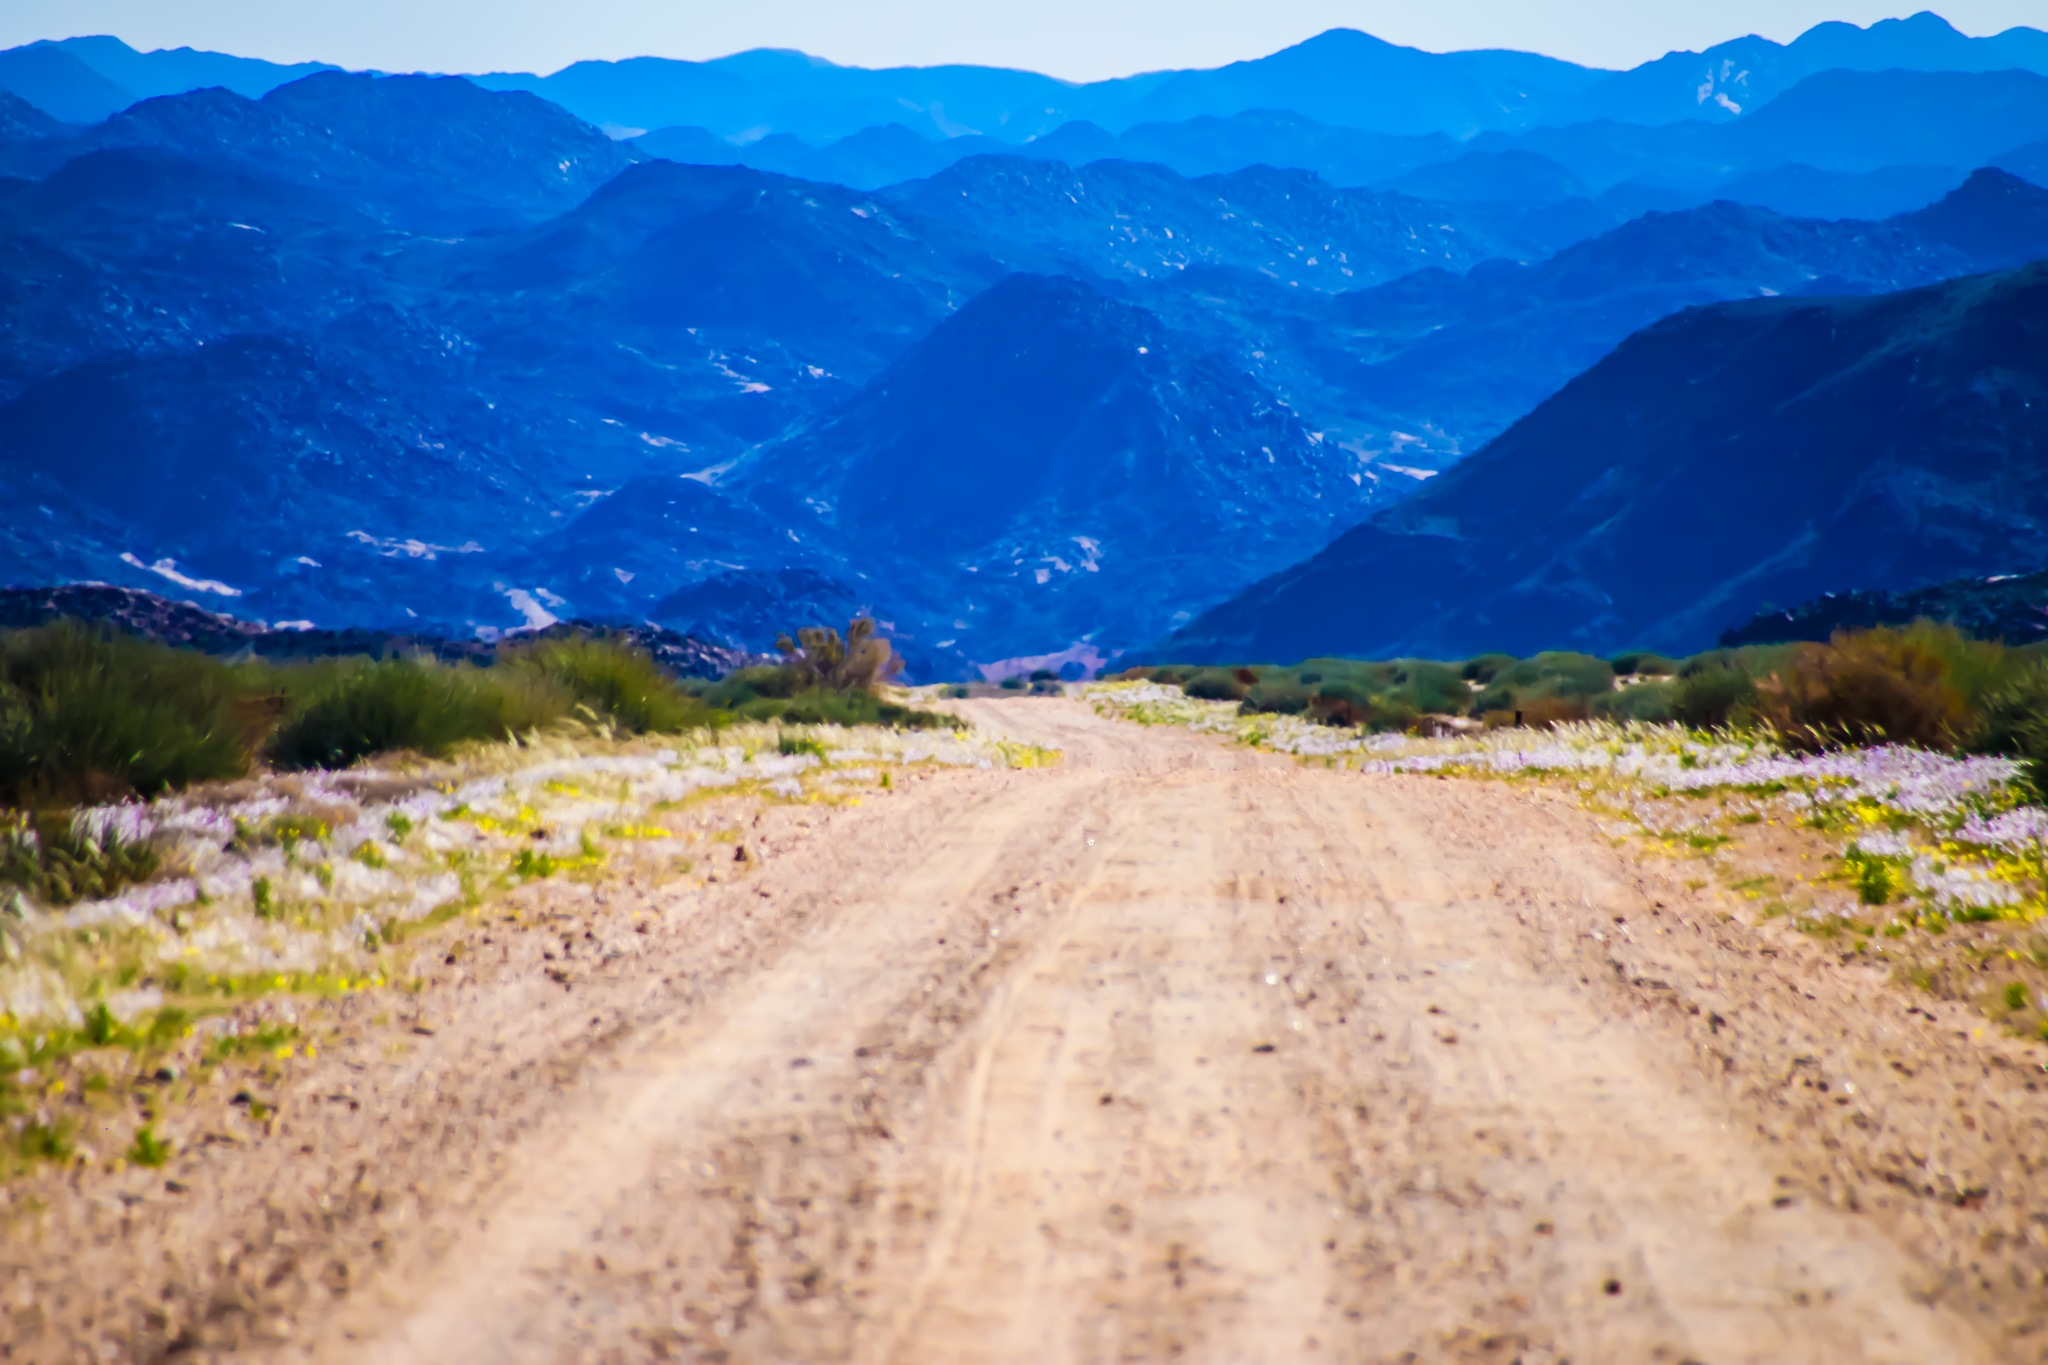 Mountain range Namakwa by TsemojaPhotography